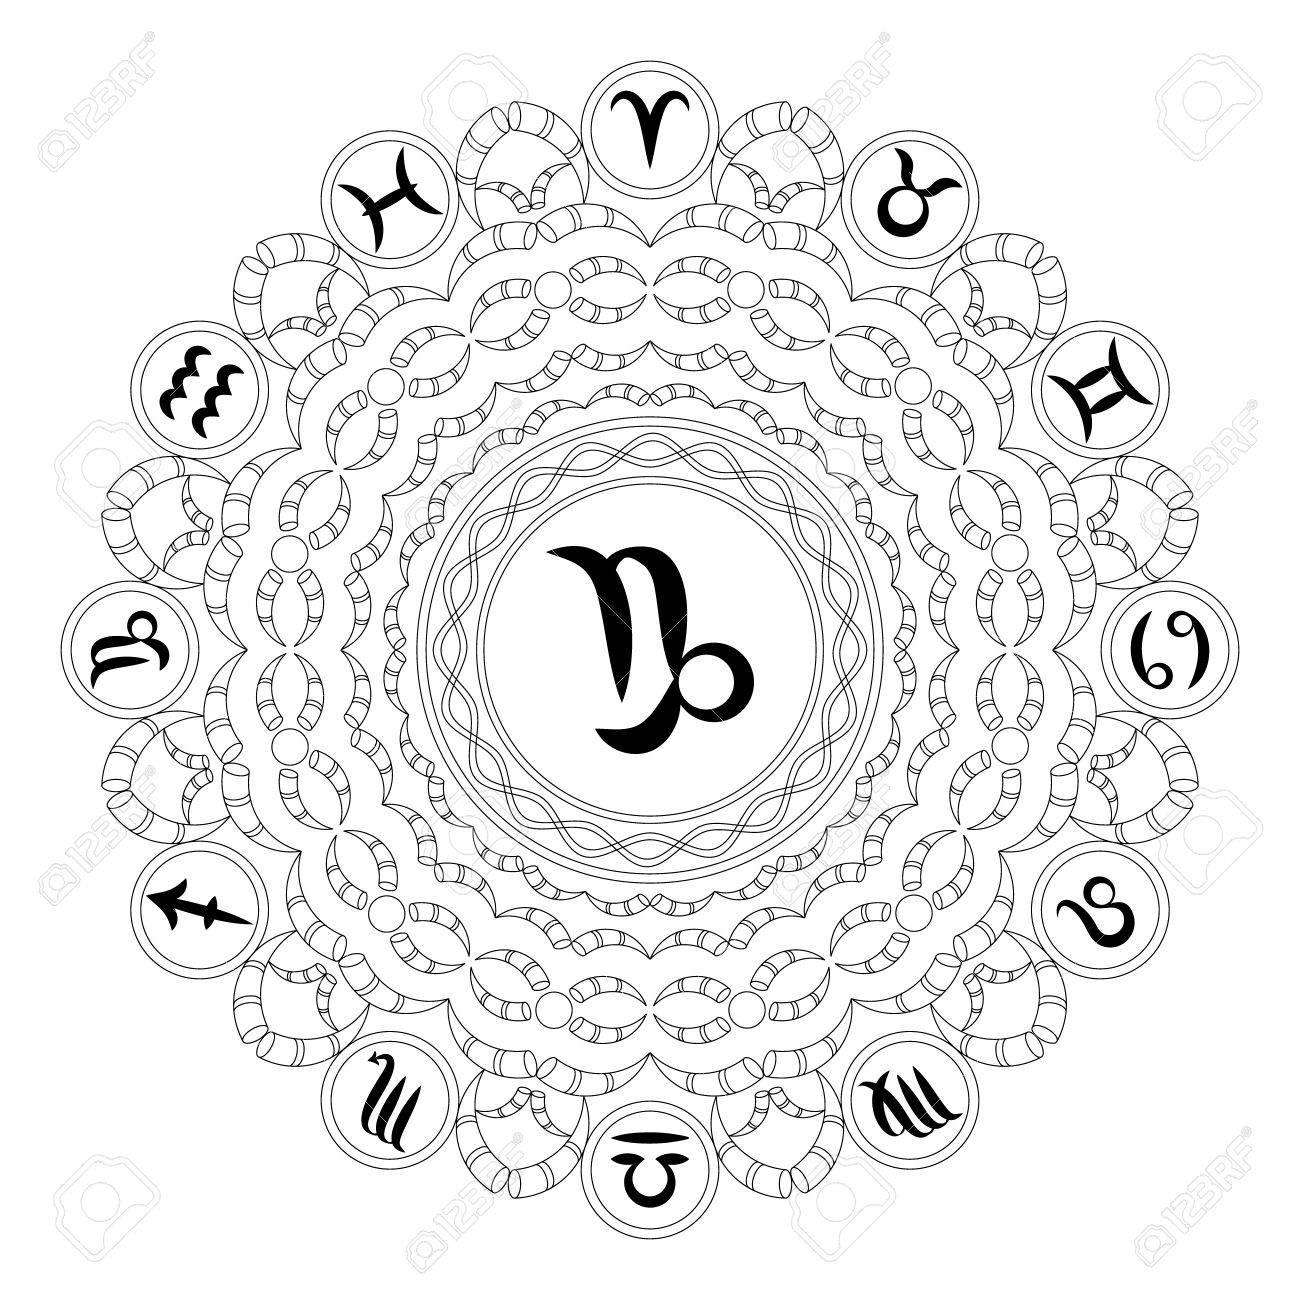 Vector black and white round geometric mandala with zodiac symbol vector black and white round geometric mandala with zodiac symbol of capricorn adult coloring book buycottarizona